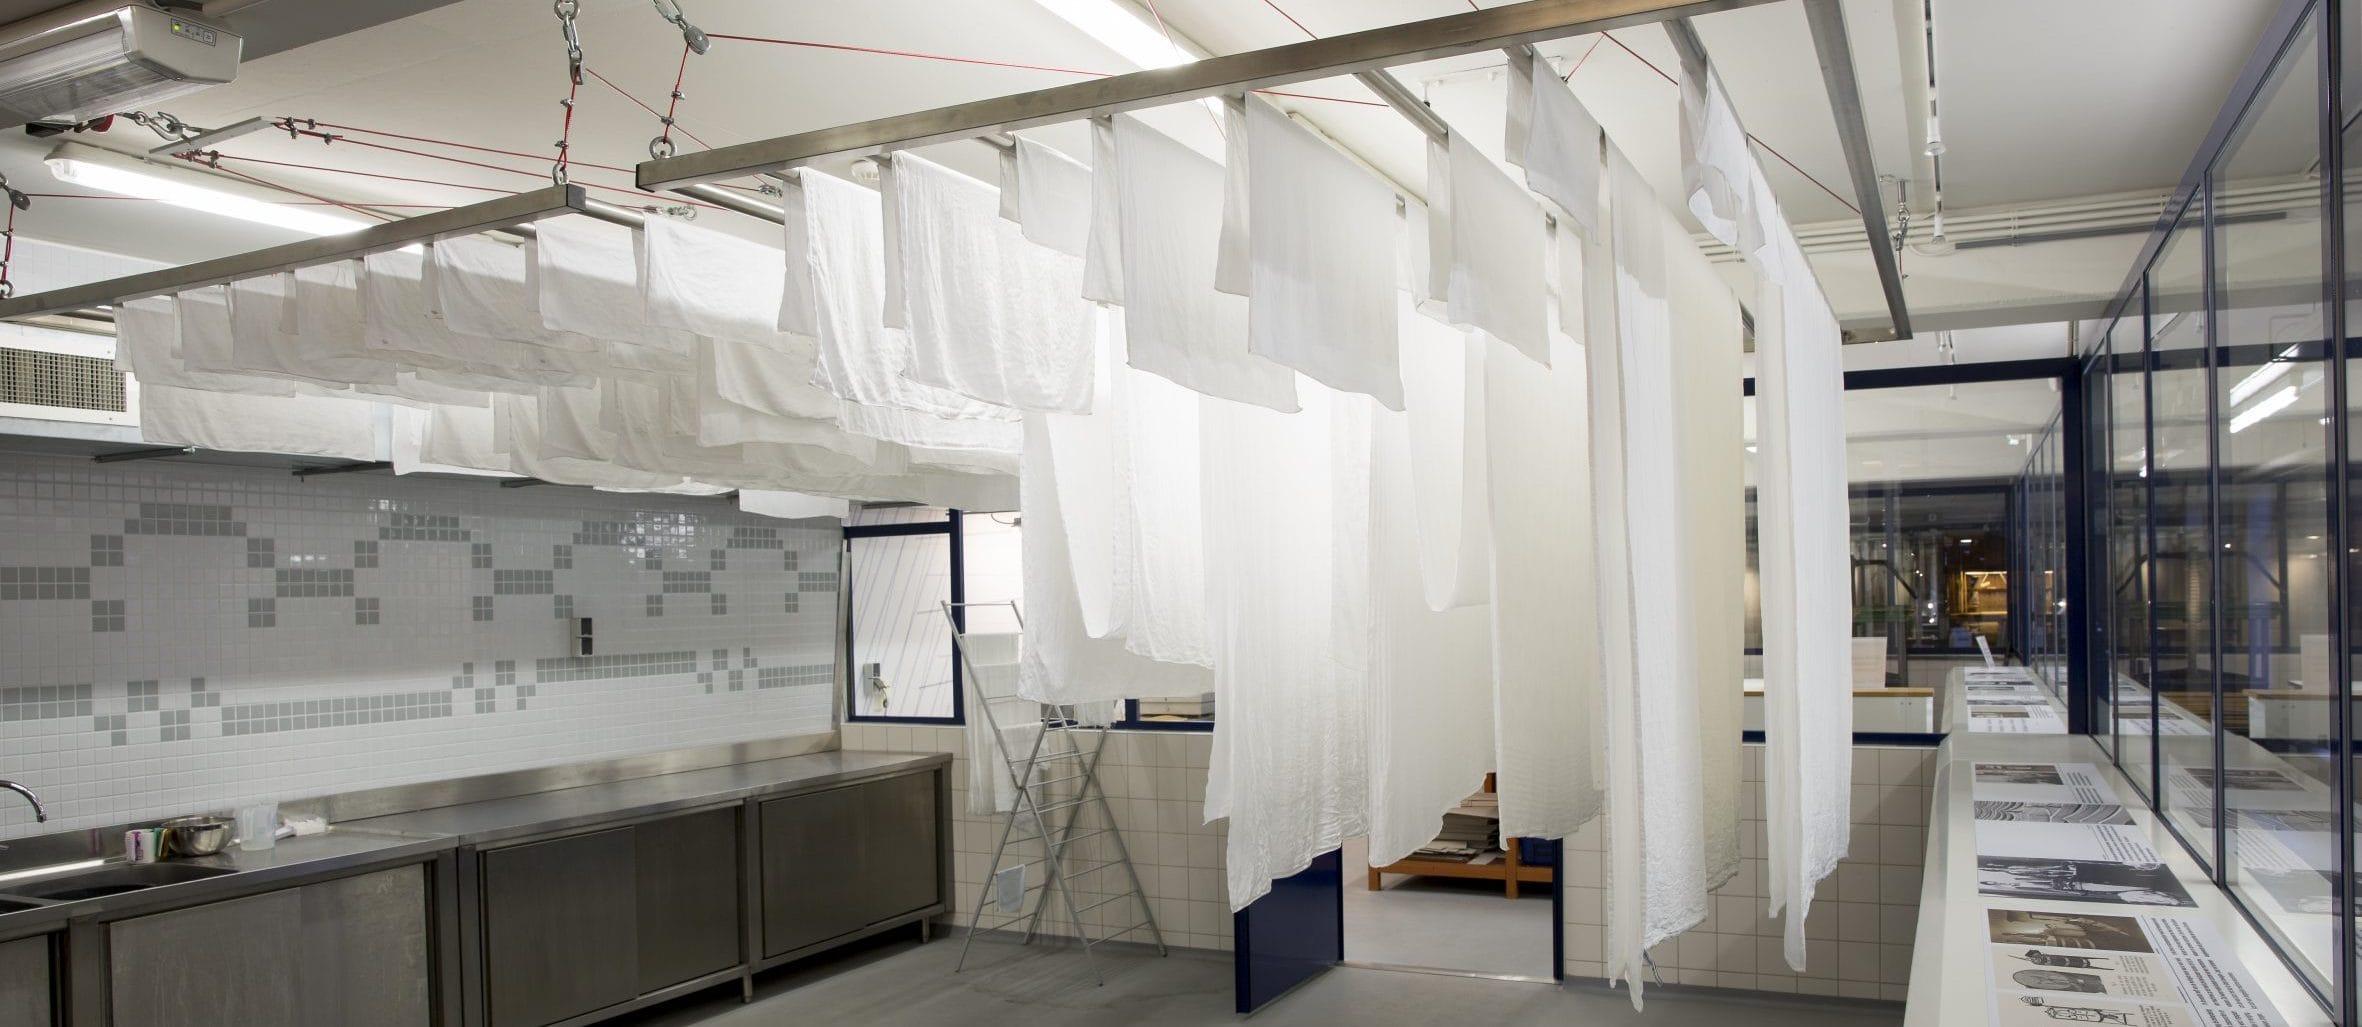 Damaks Laundry. Photo Tommy de Lange i.o.v. TextielMuseum